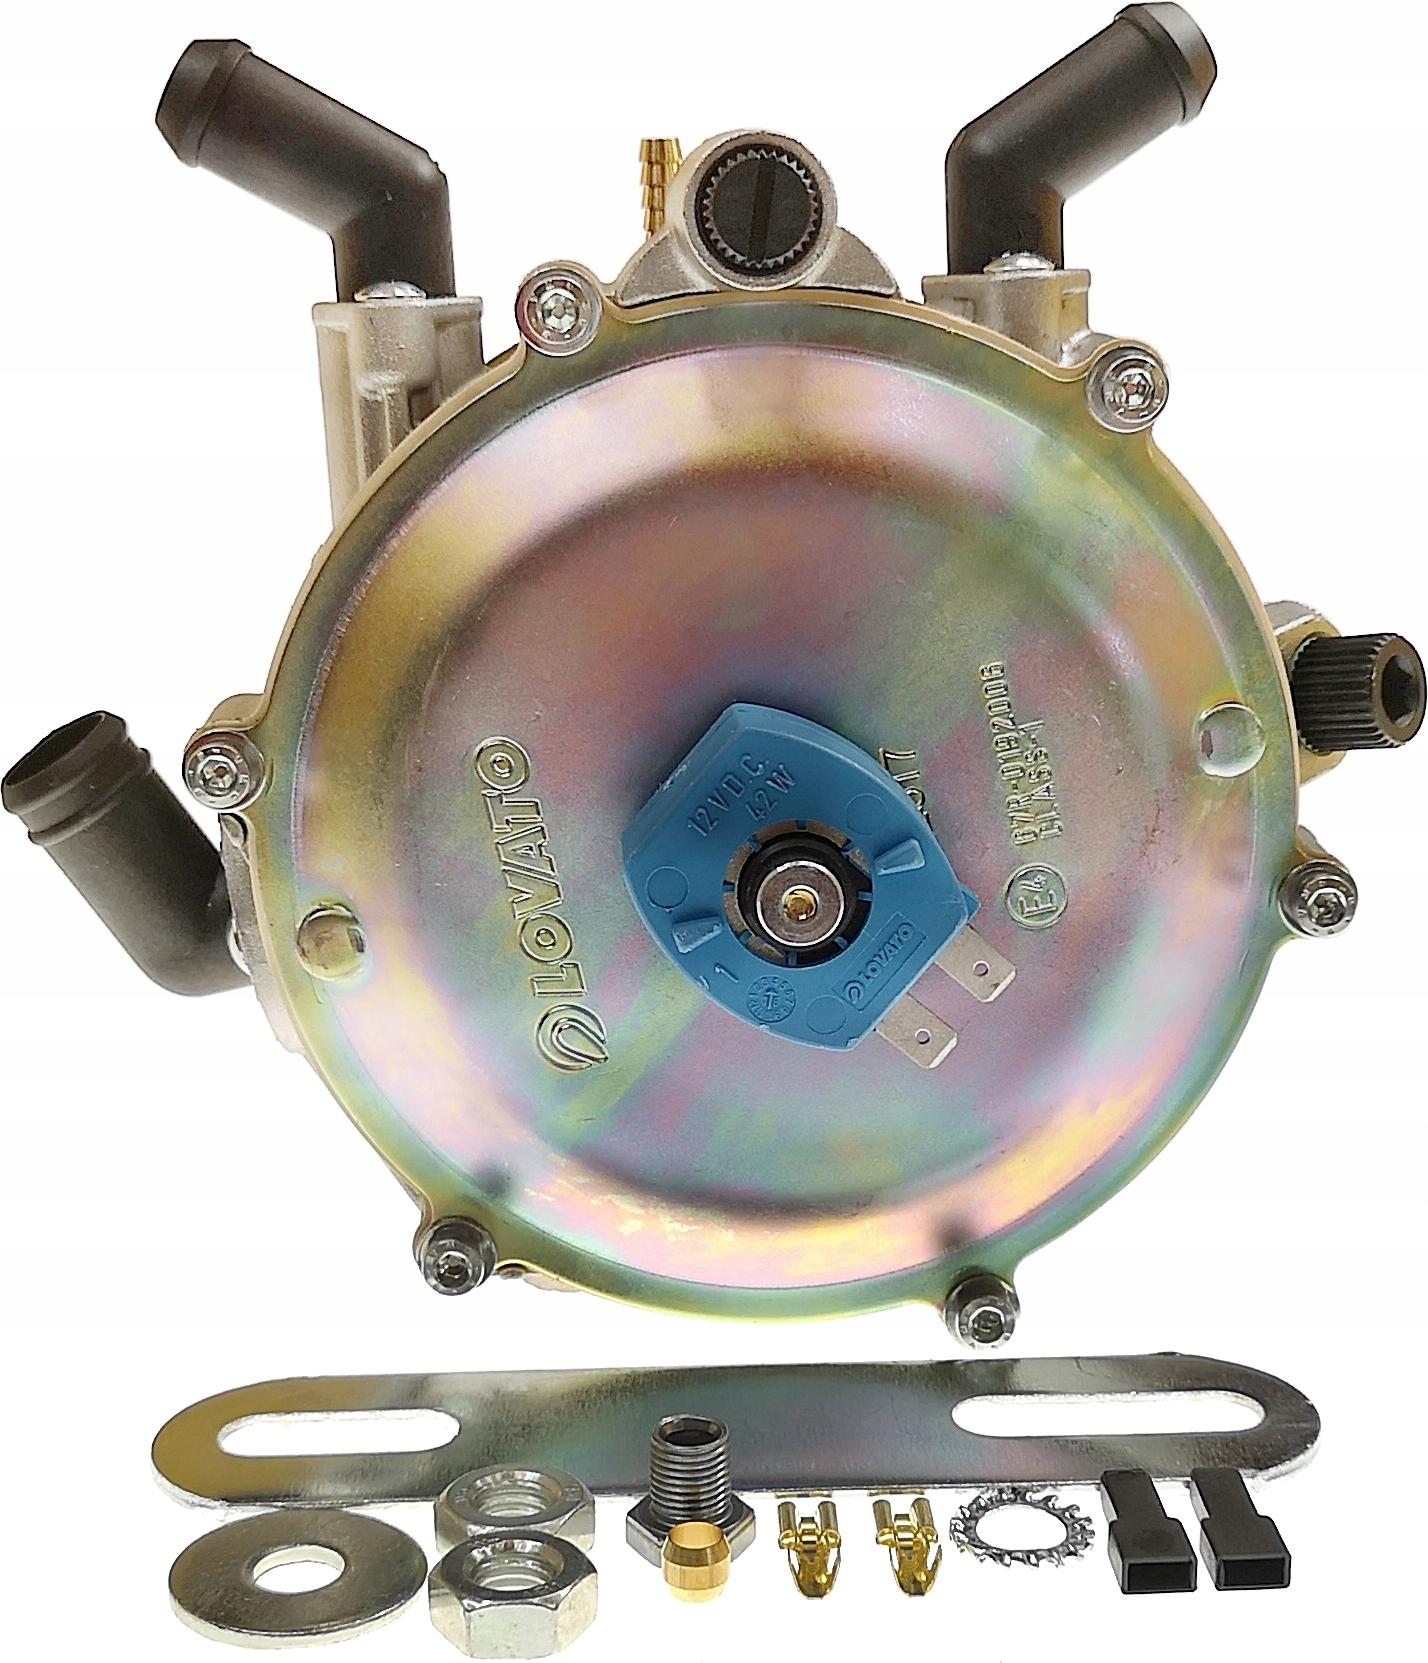 ловато испаритель газа редуктор rg 80 карбюратор коляска